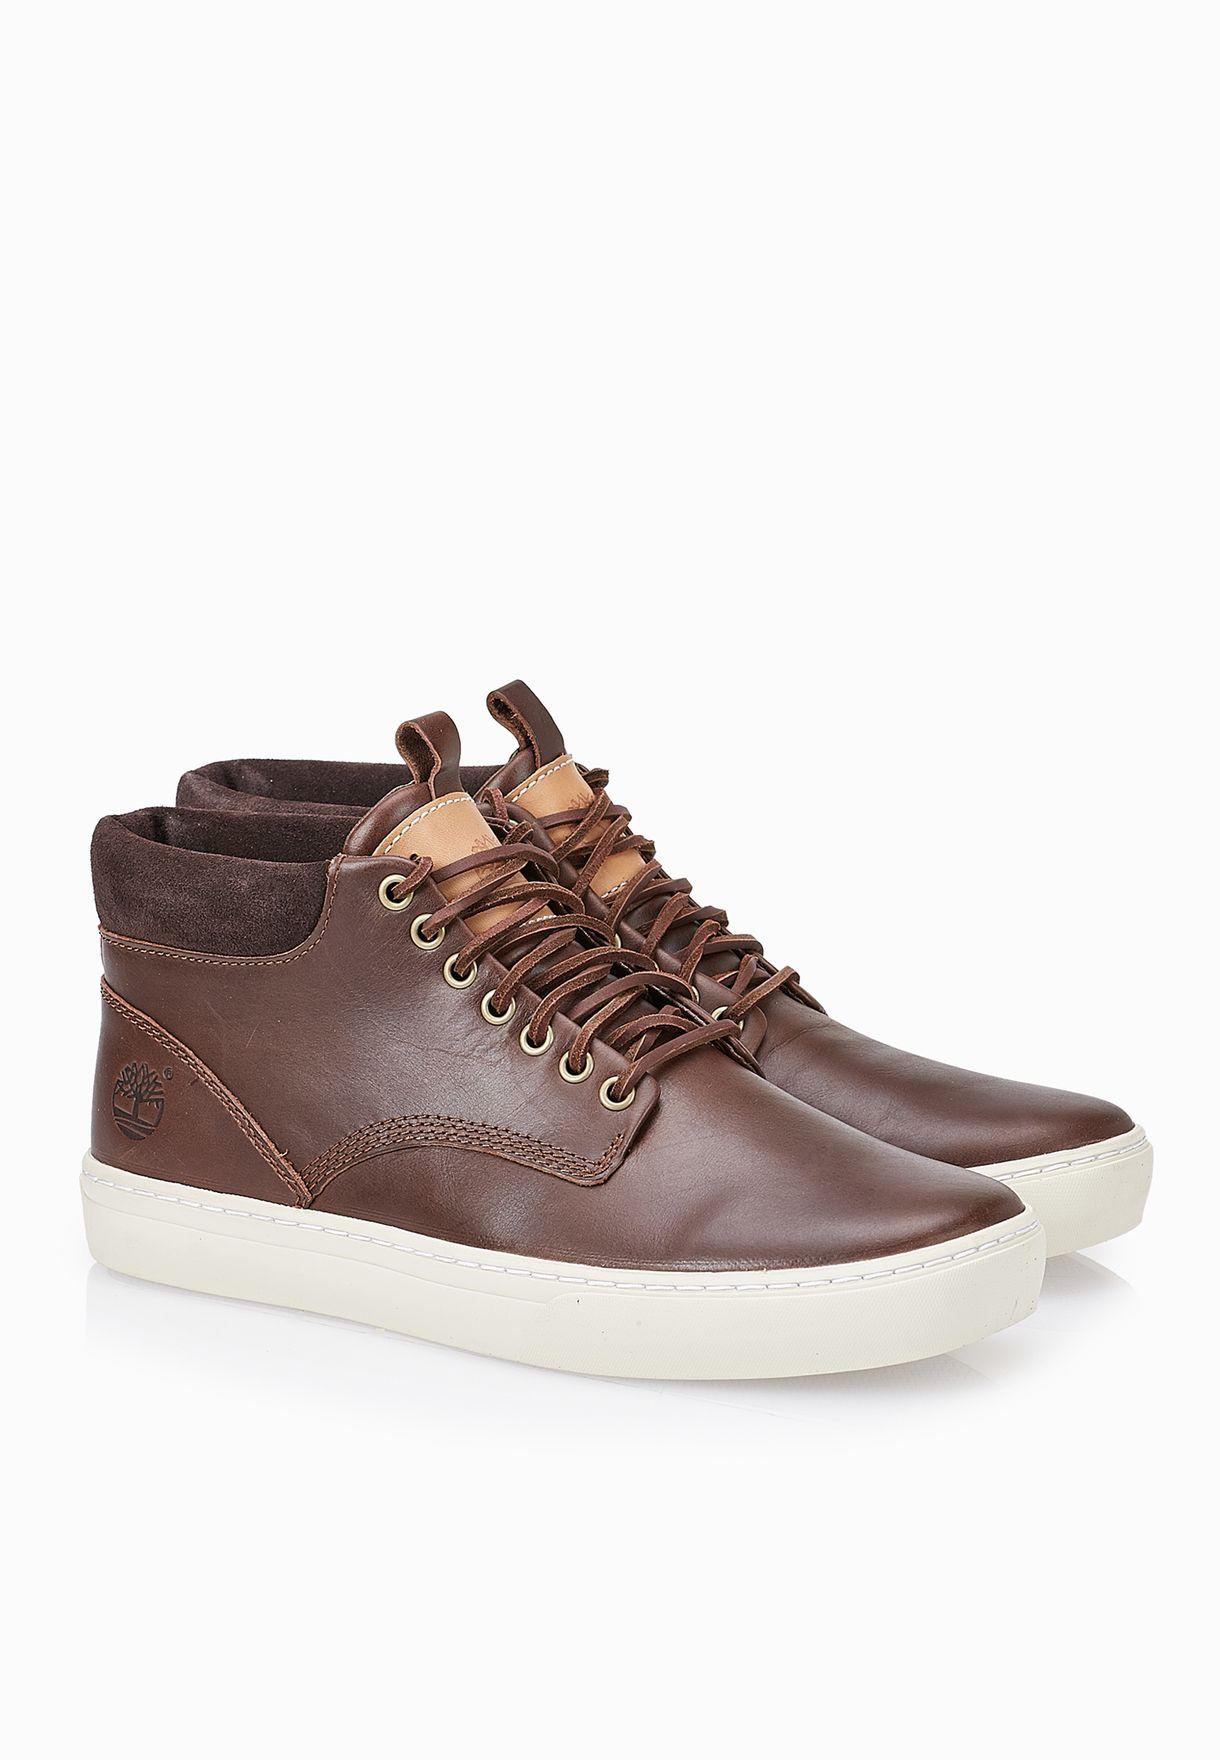 Shop Timberland browns Adventure 2.0 Cupsole Chukka Boots TMFT ... 3b784060b29